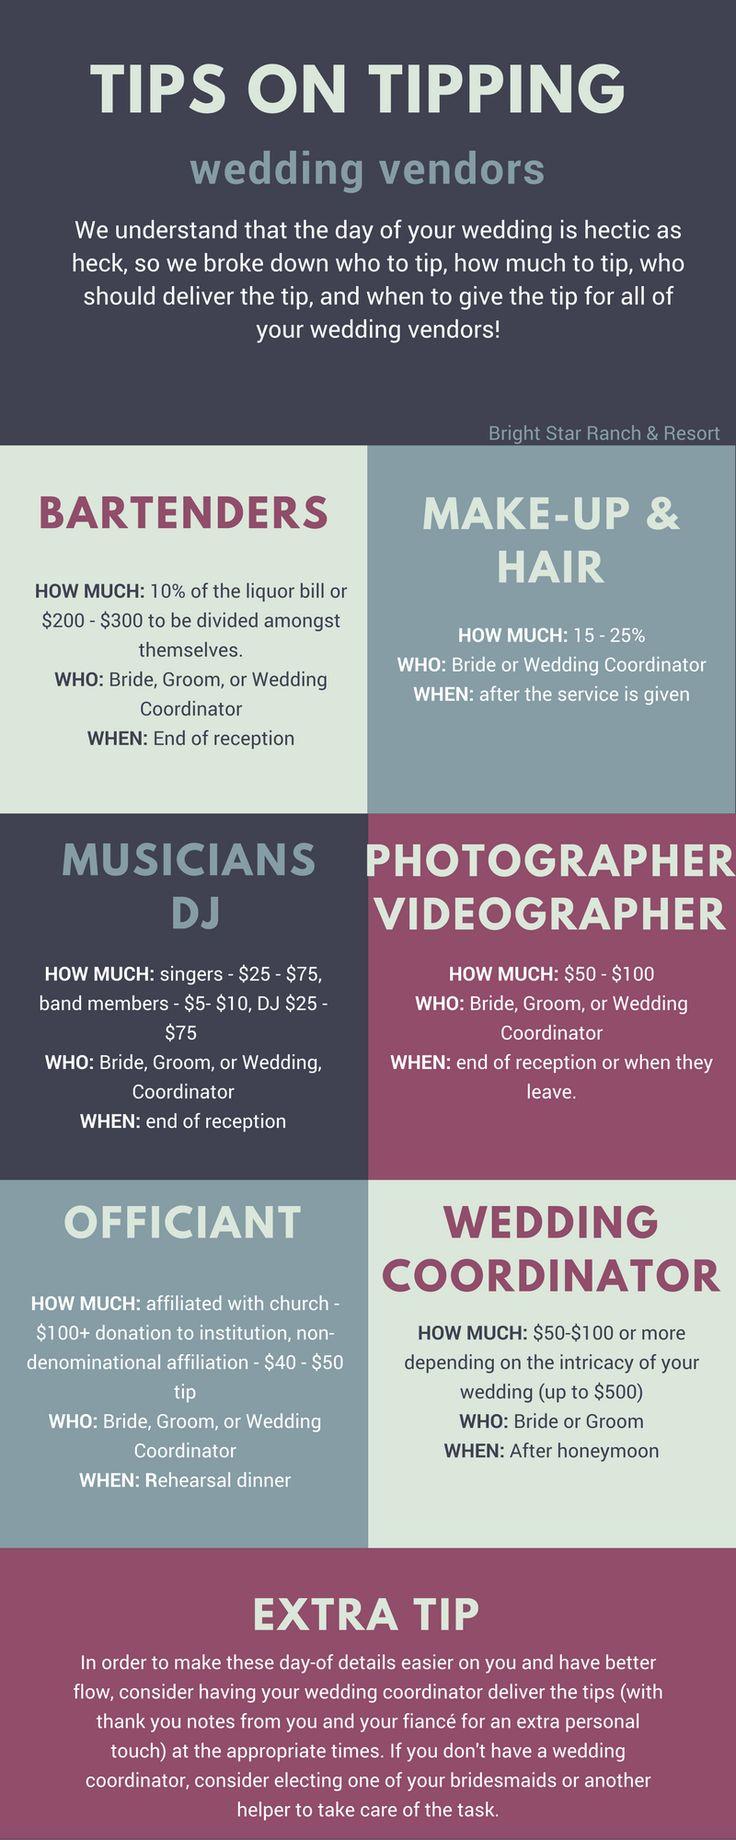 Tips on Tipping Wedding Vendors — Bright Star Ranch & Resort